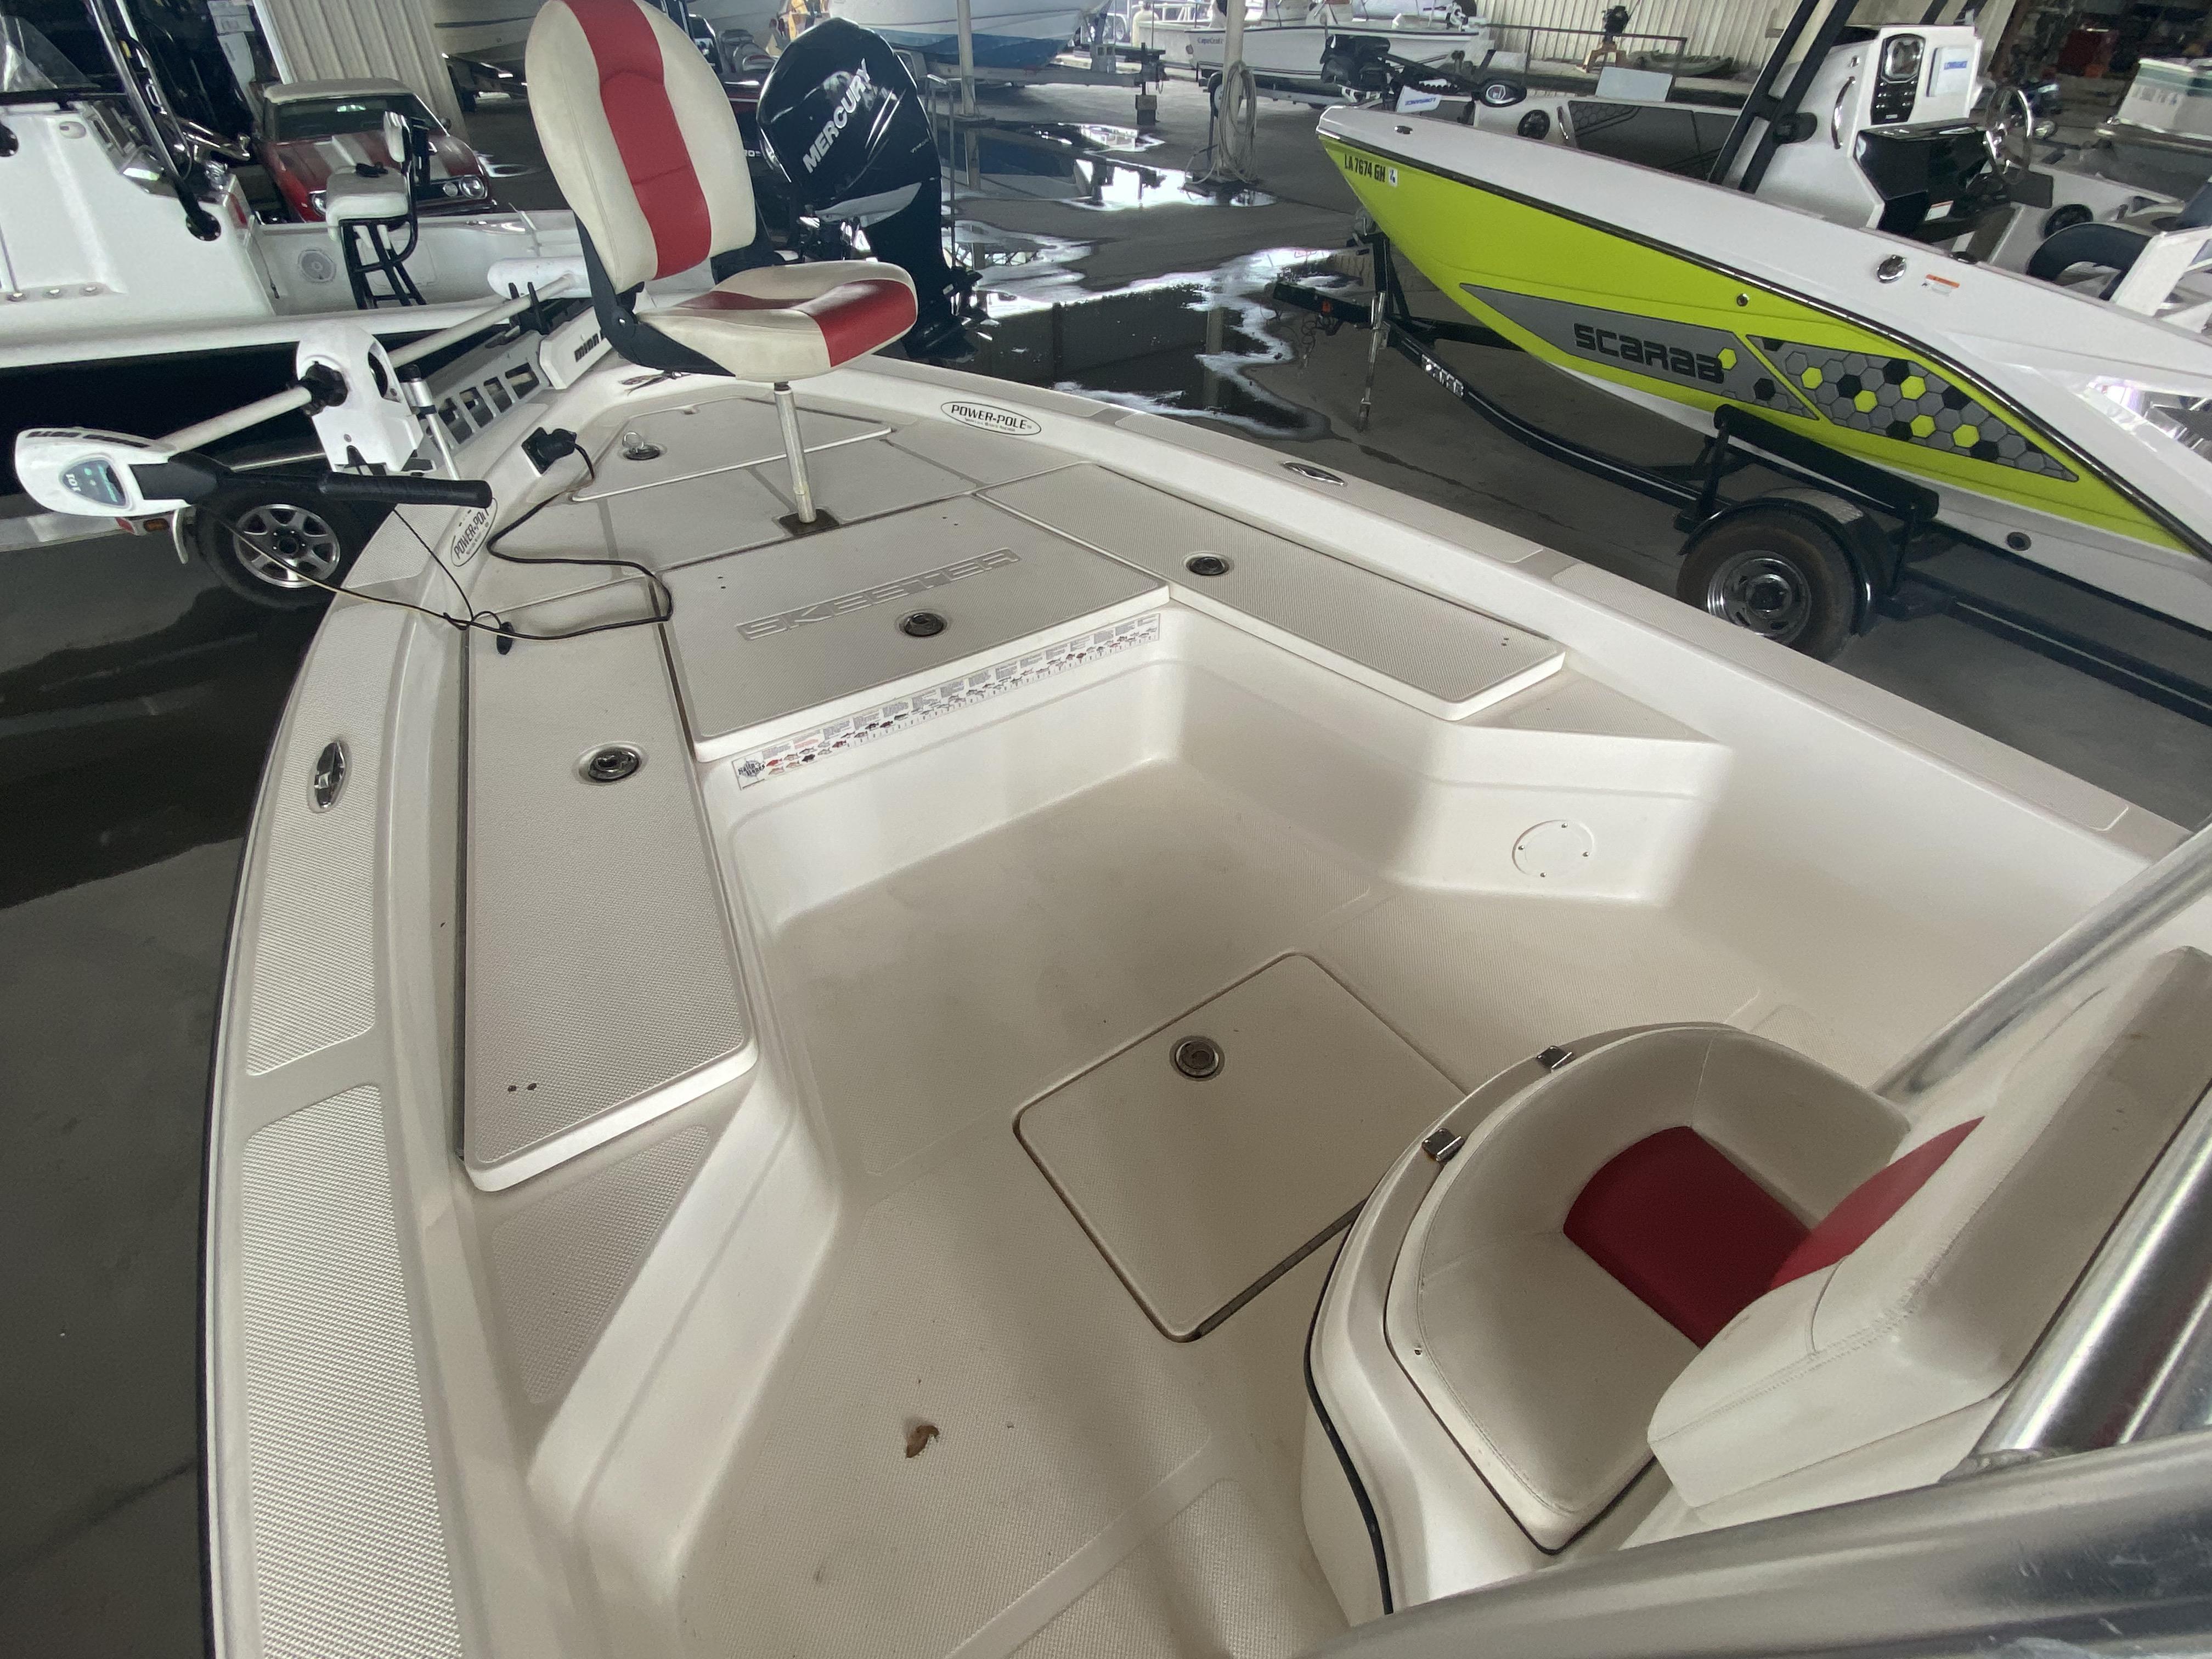 2010 Skeeter boat for sale, model of the boat is ZX24V & Image # 11 of 16